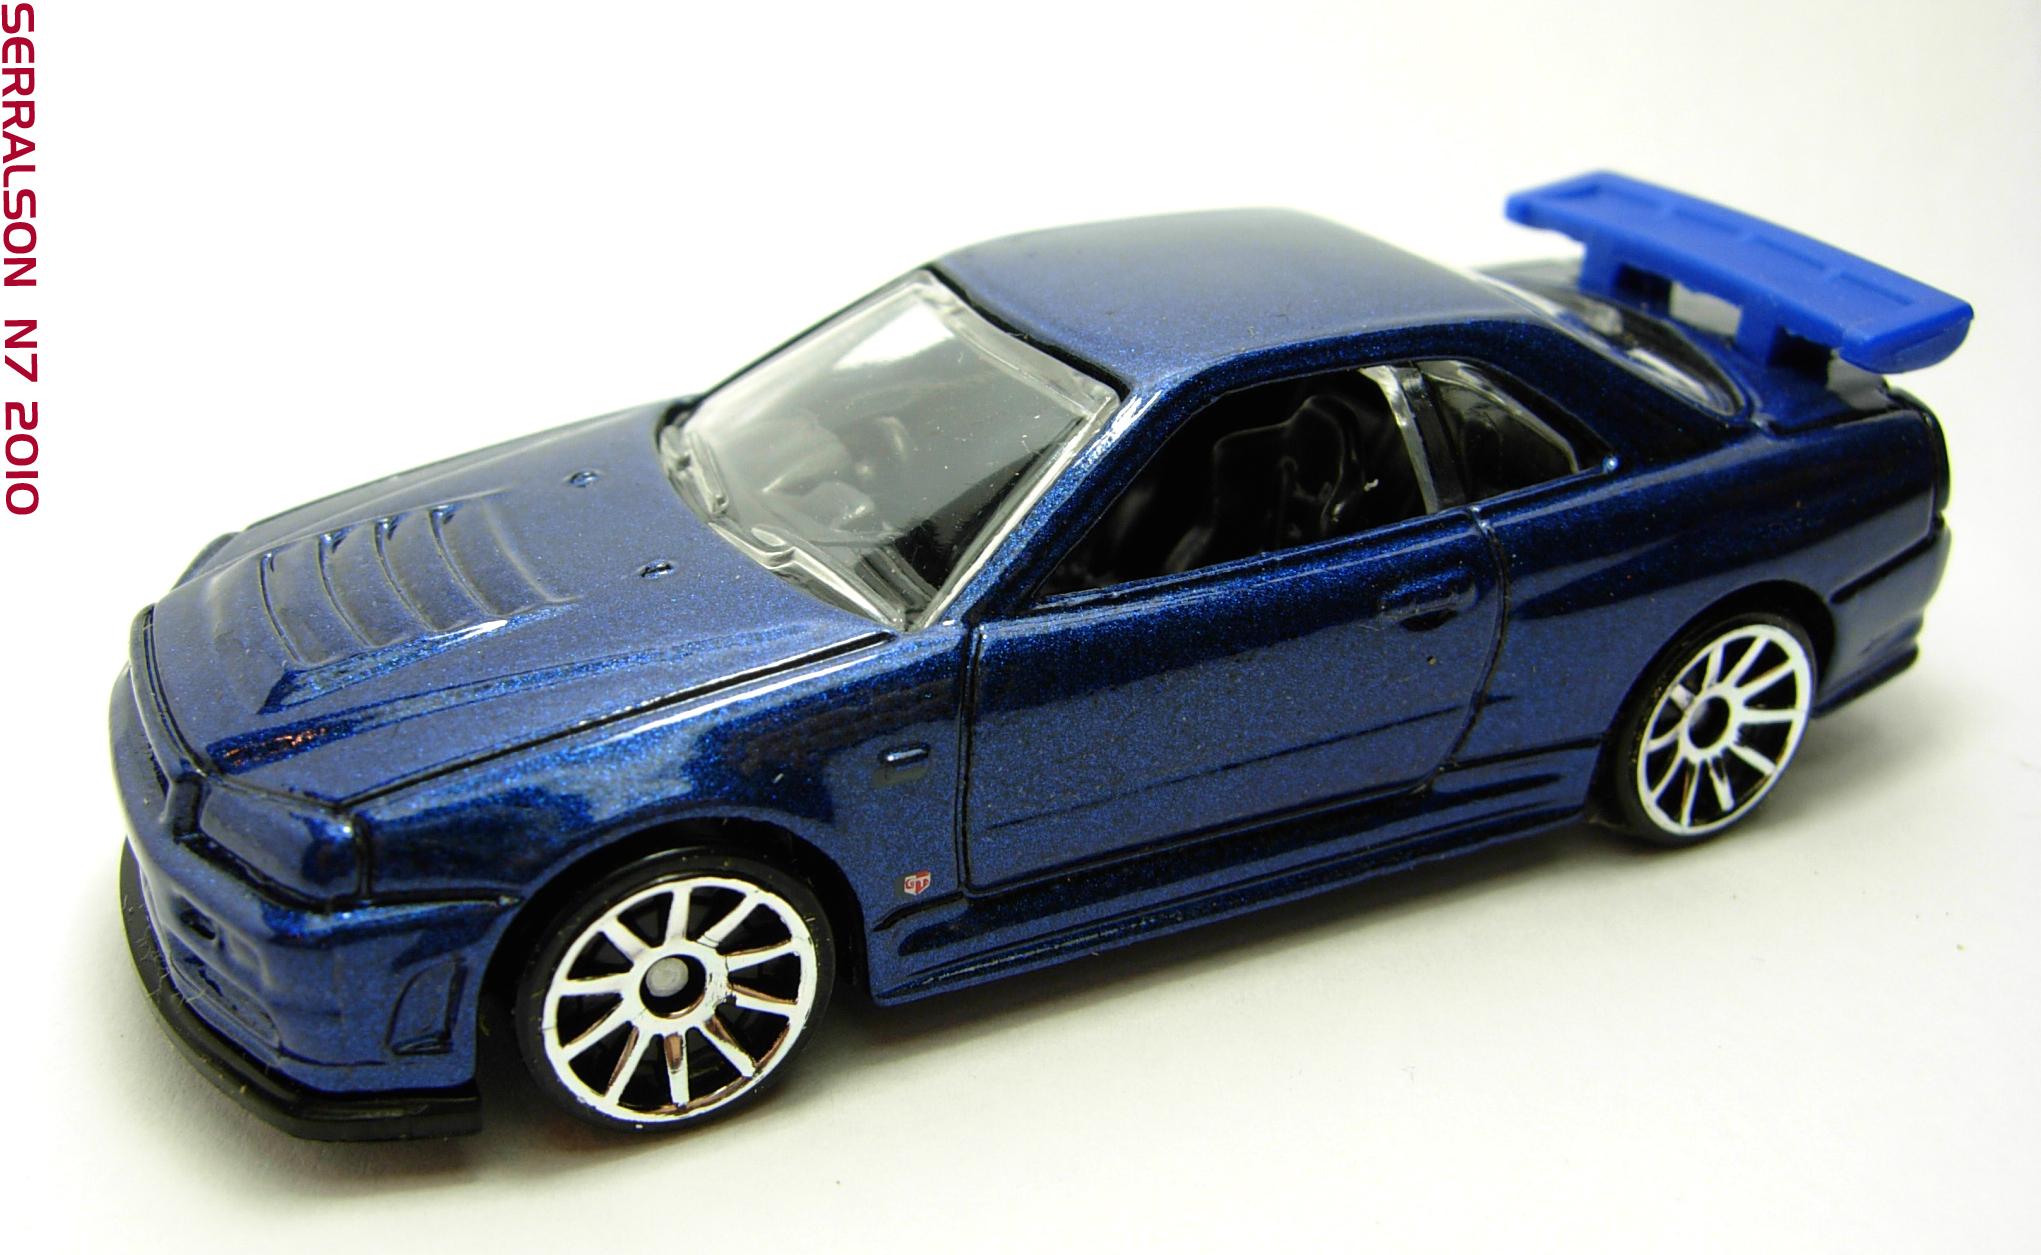 Nissan Skyline Gt R R34 Hot Wheels Wiki